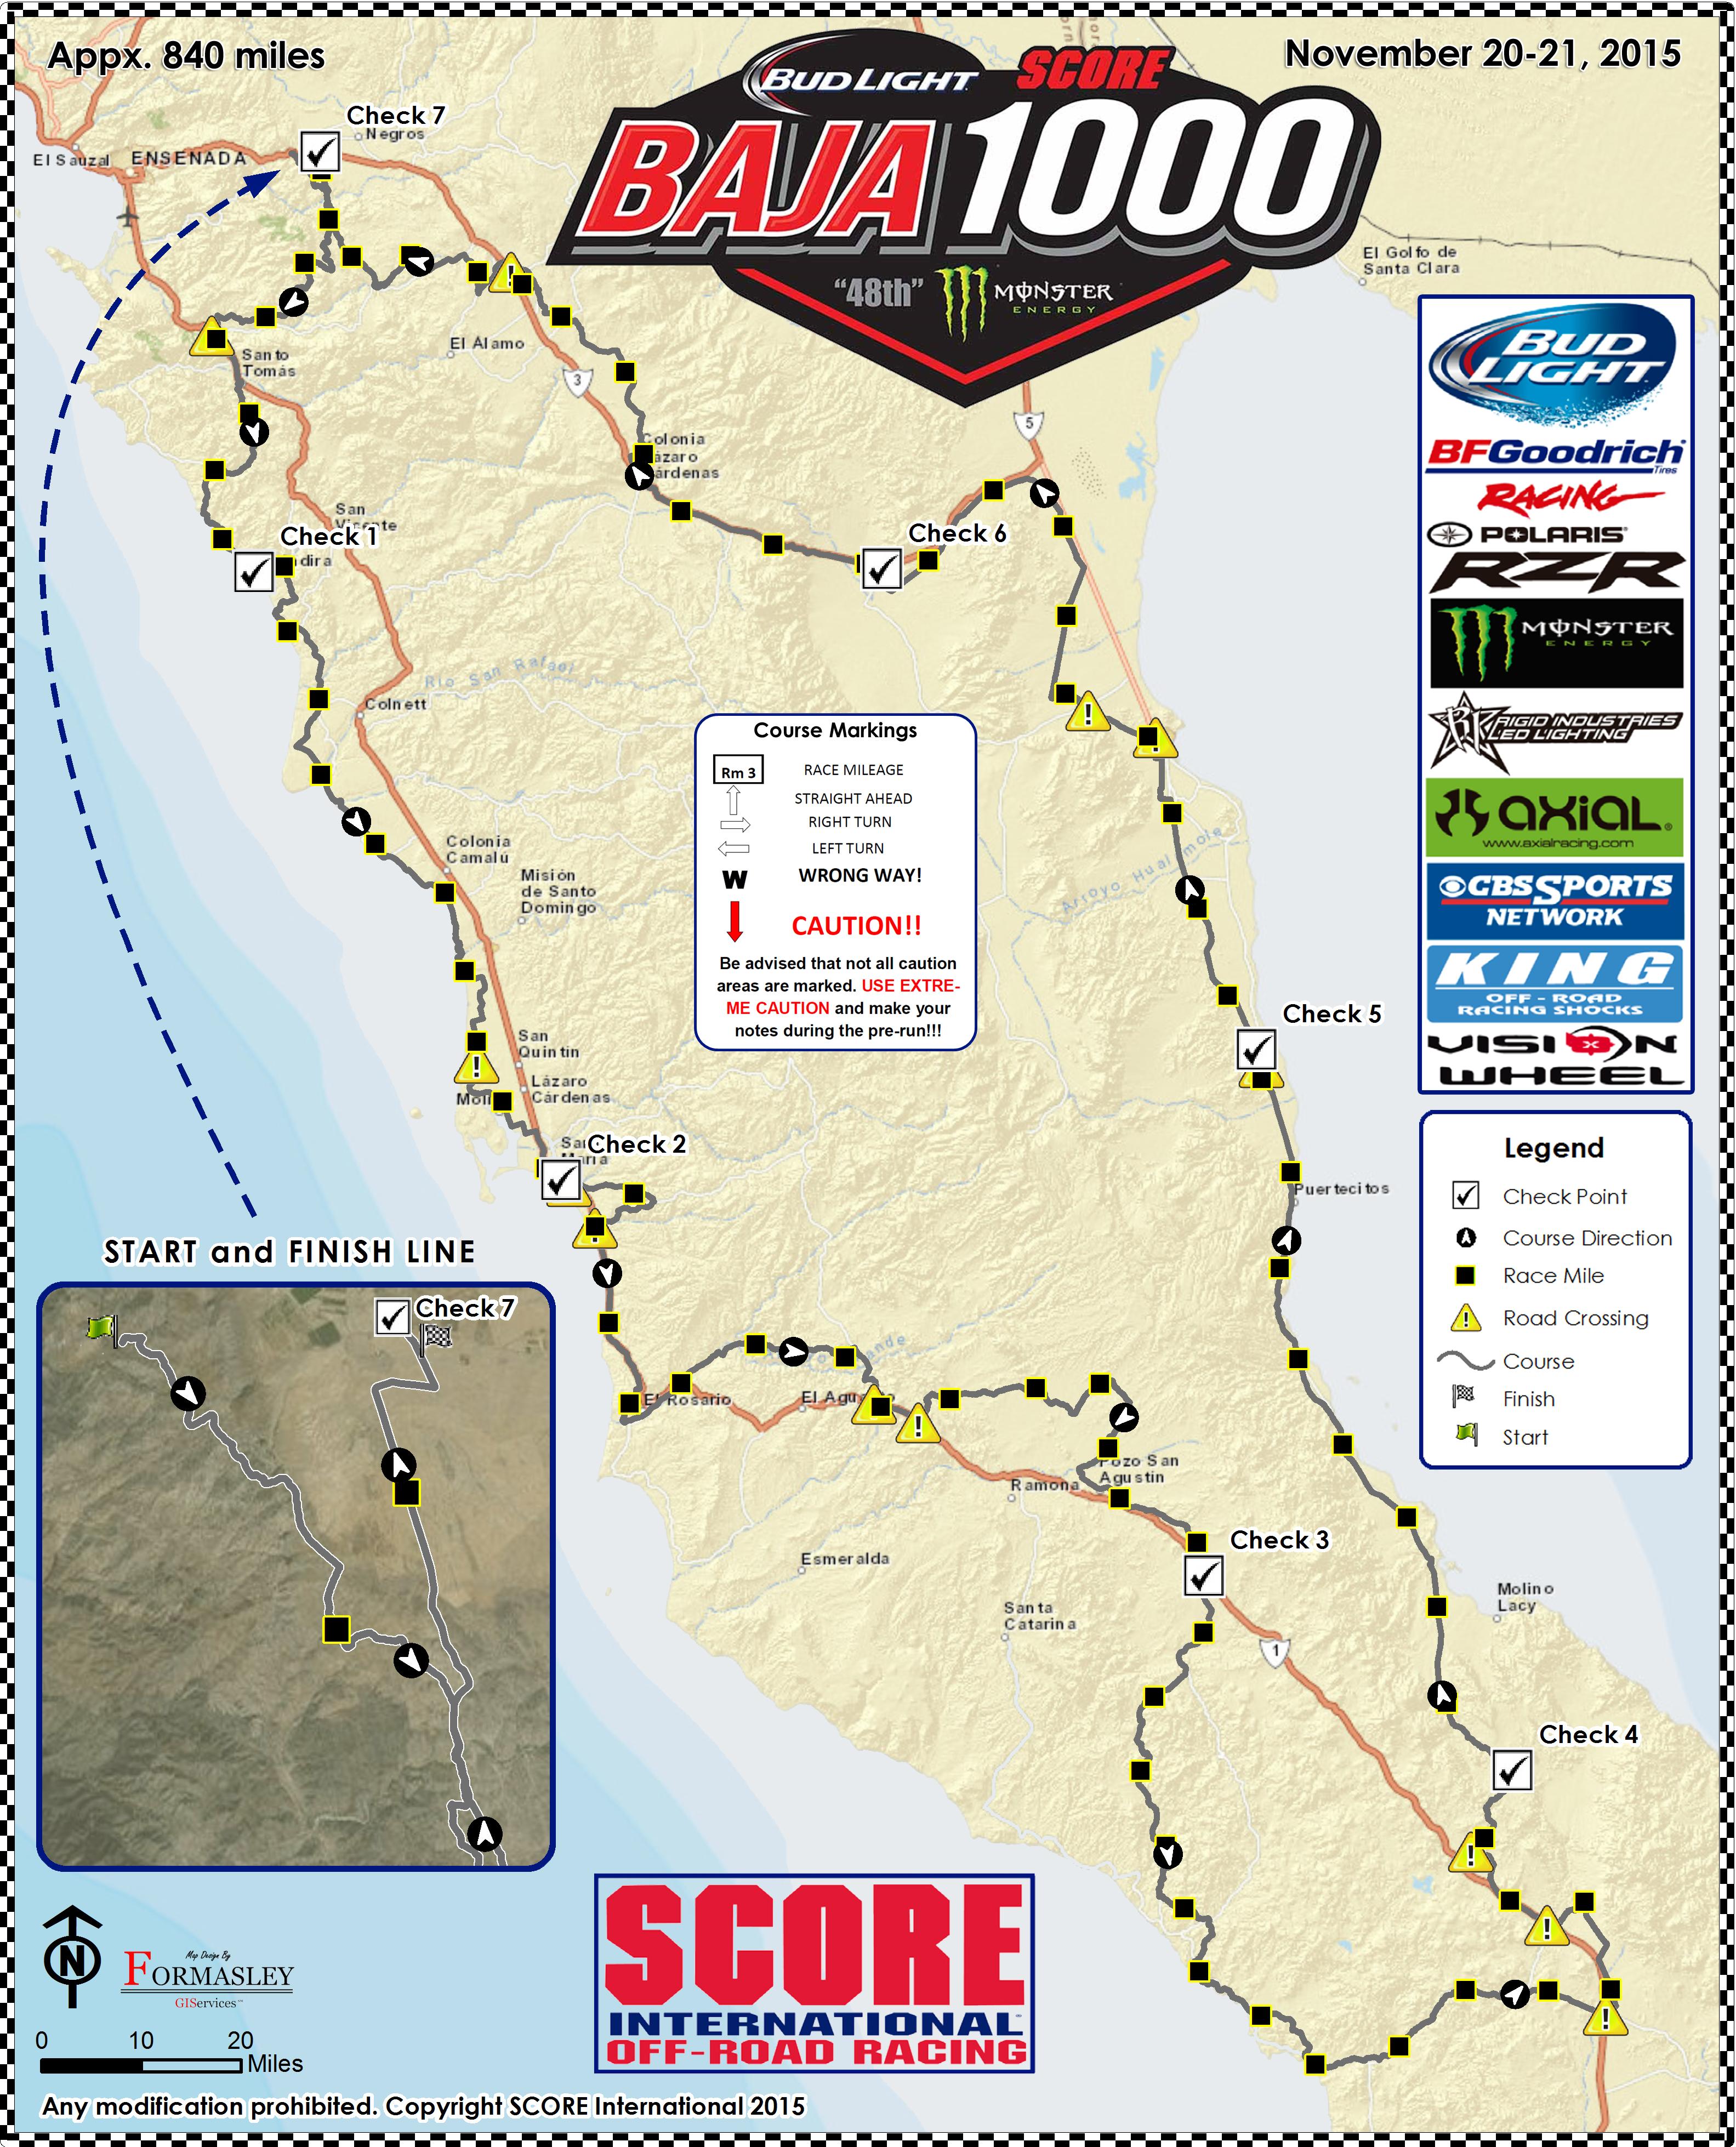 Baja 1000 Map Preliminary Race Course Map Released for 2015 Bud Light SCORE Baja